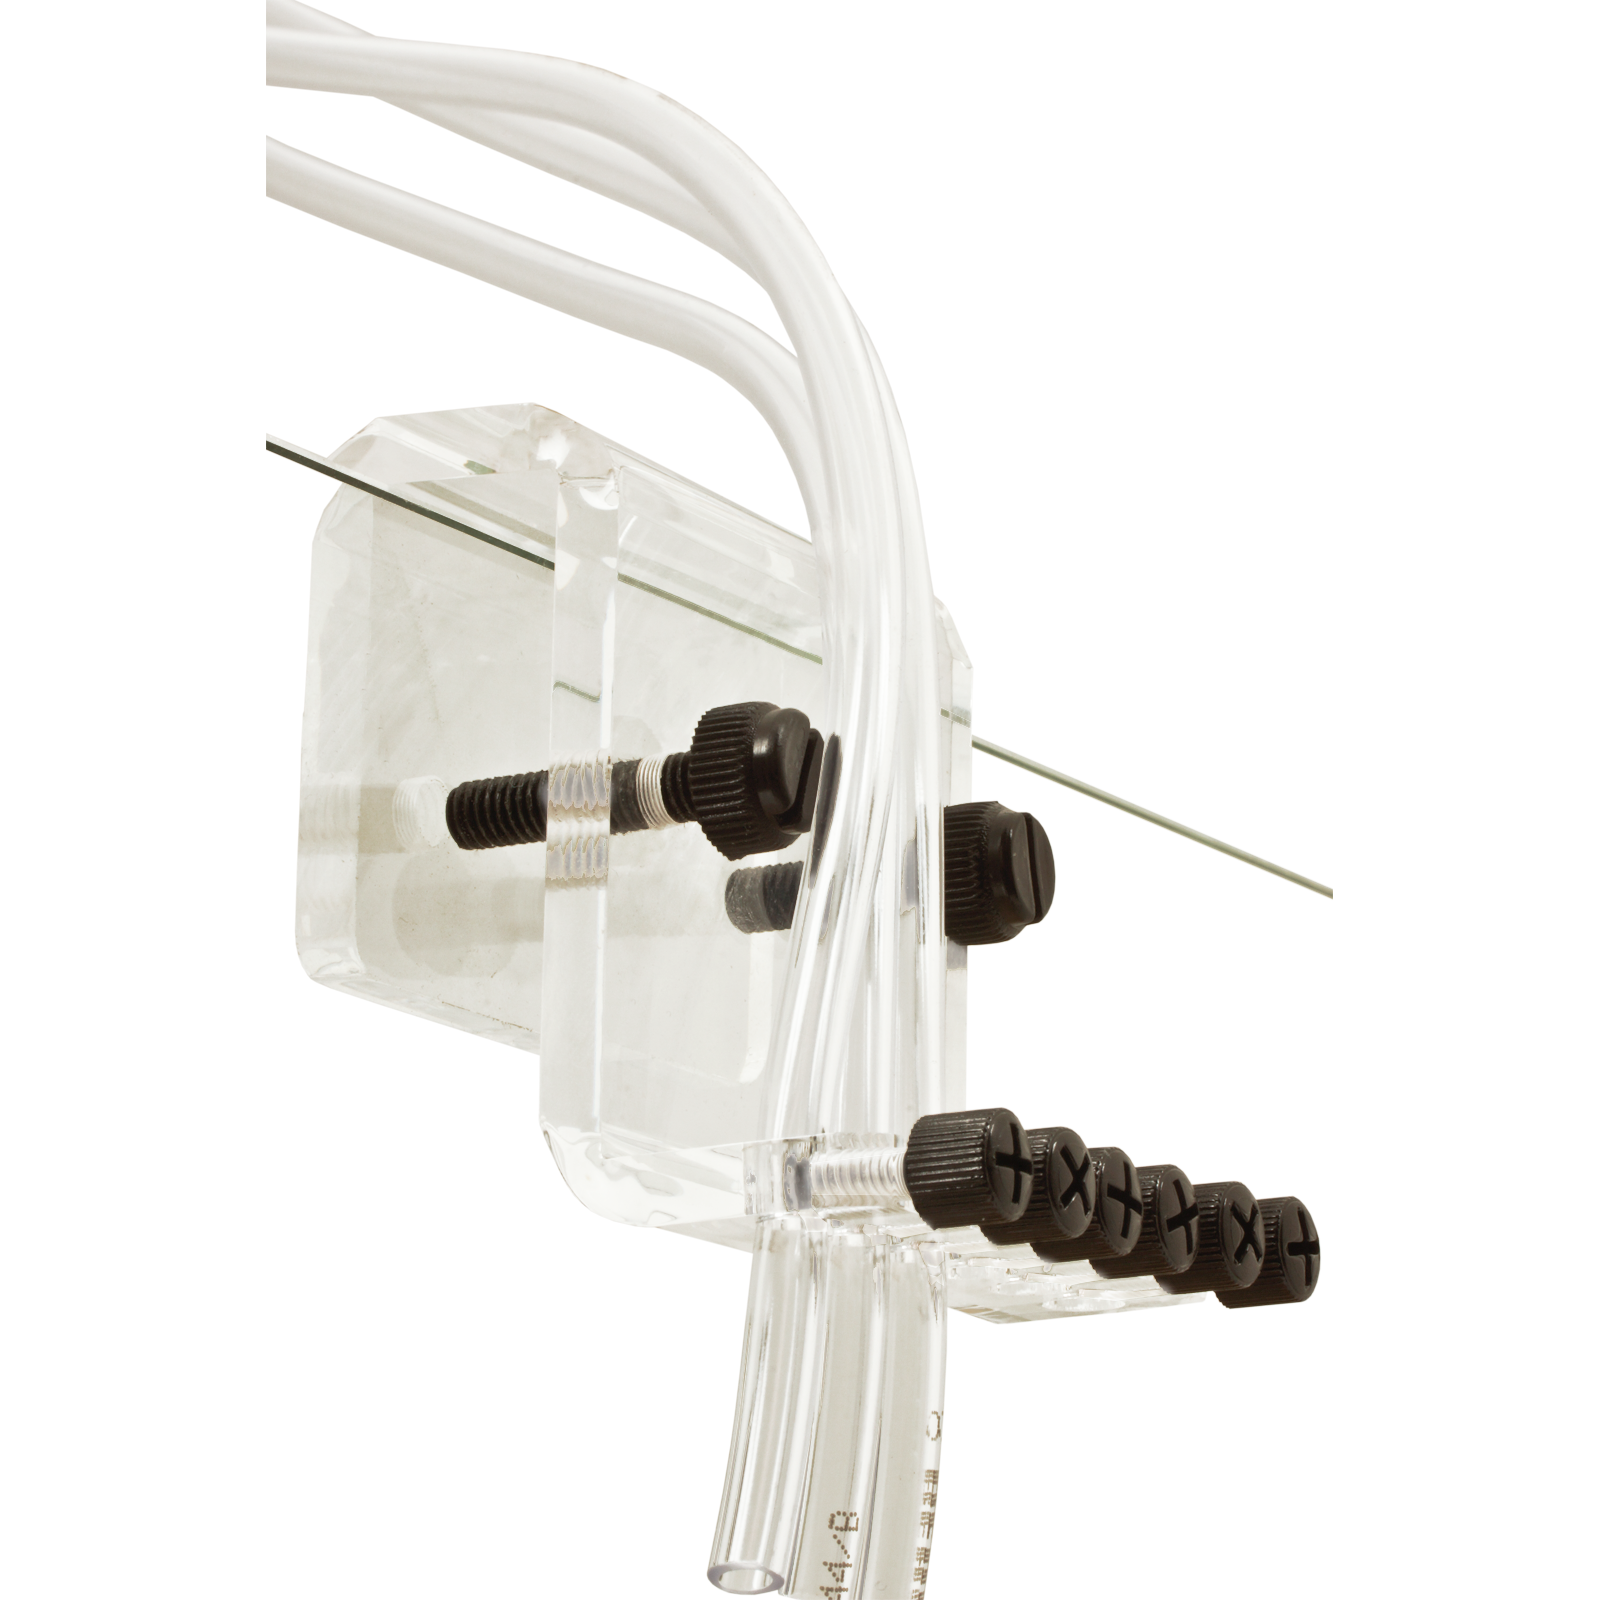 AQUA MEDIC 6-tubes support pour 6 tuyaux diamètres 6 mm